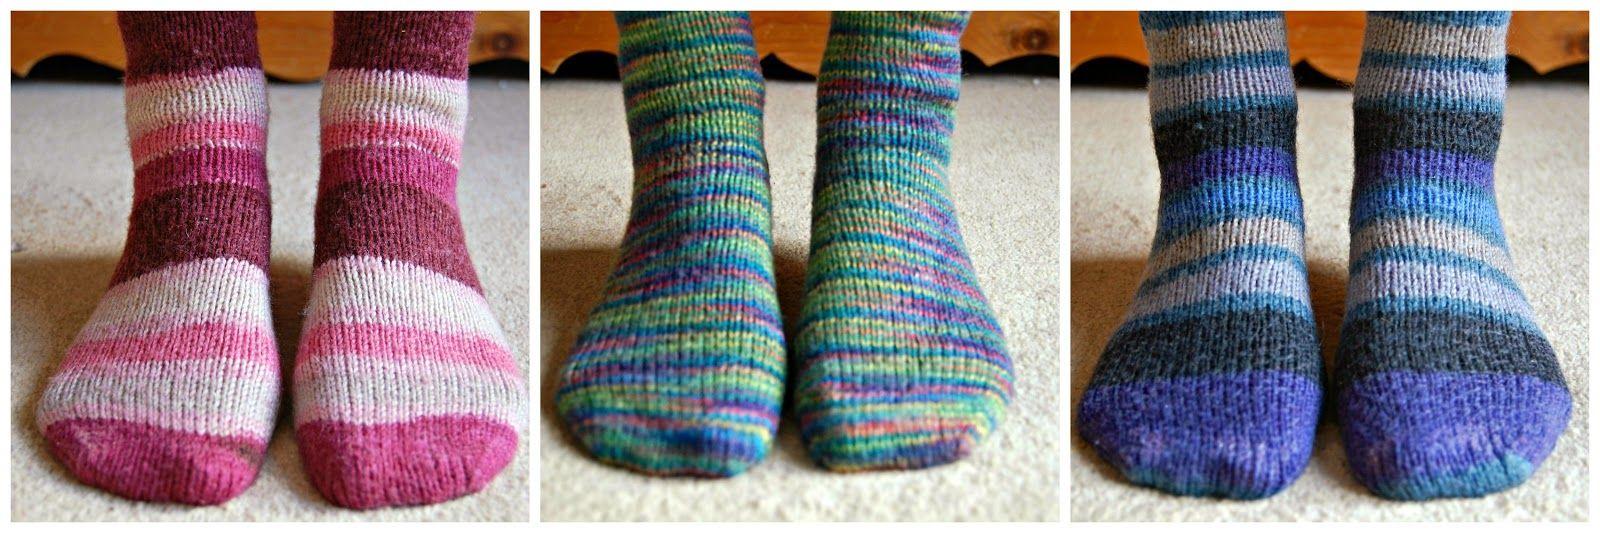 Winwick mum basic 6ply boot socks free pattern and tutorial winwick mum basic 6ply boot socks free pattern and tutorial bankloansurffo Choice Image